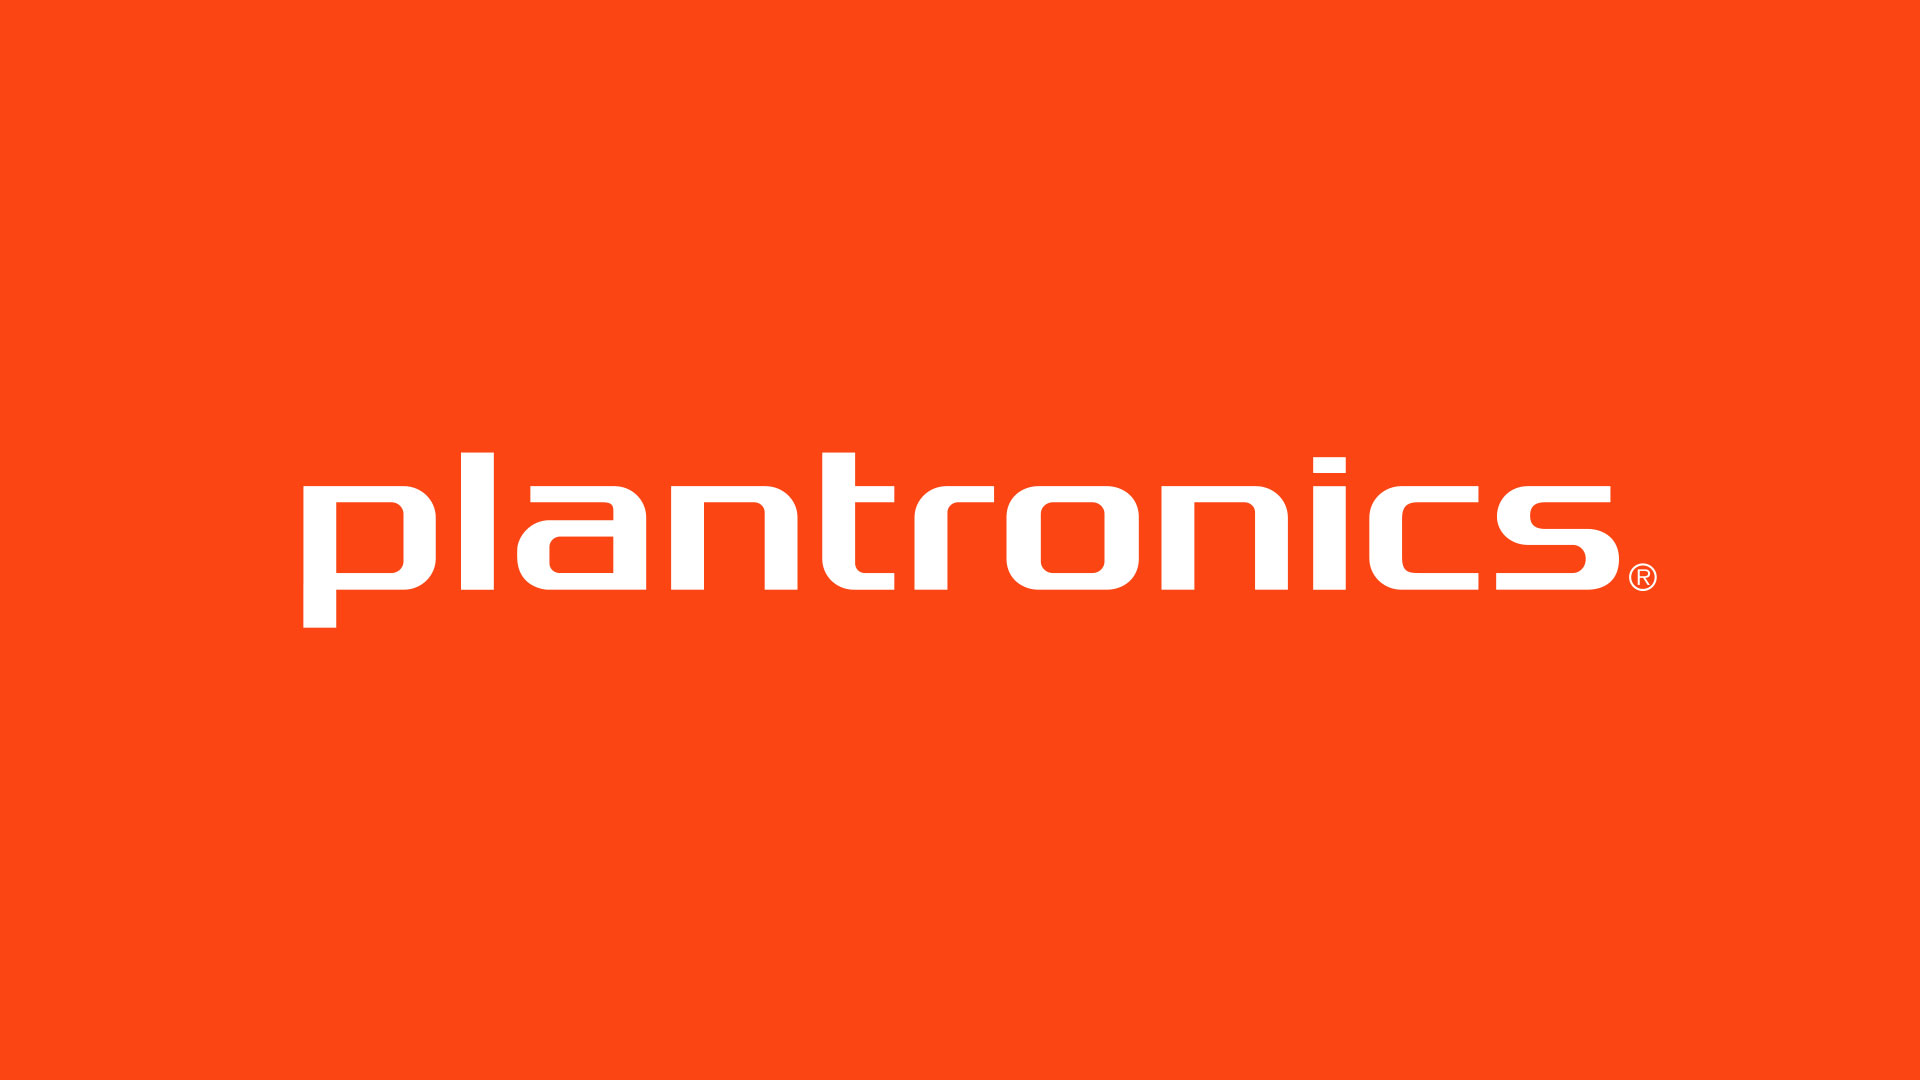 Logitech Planea Adquirir Plantronics Por Más De 2200